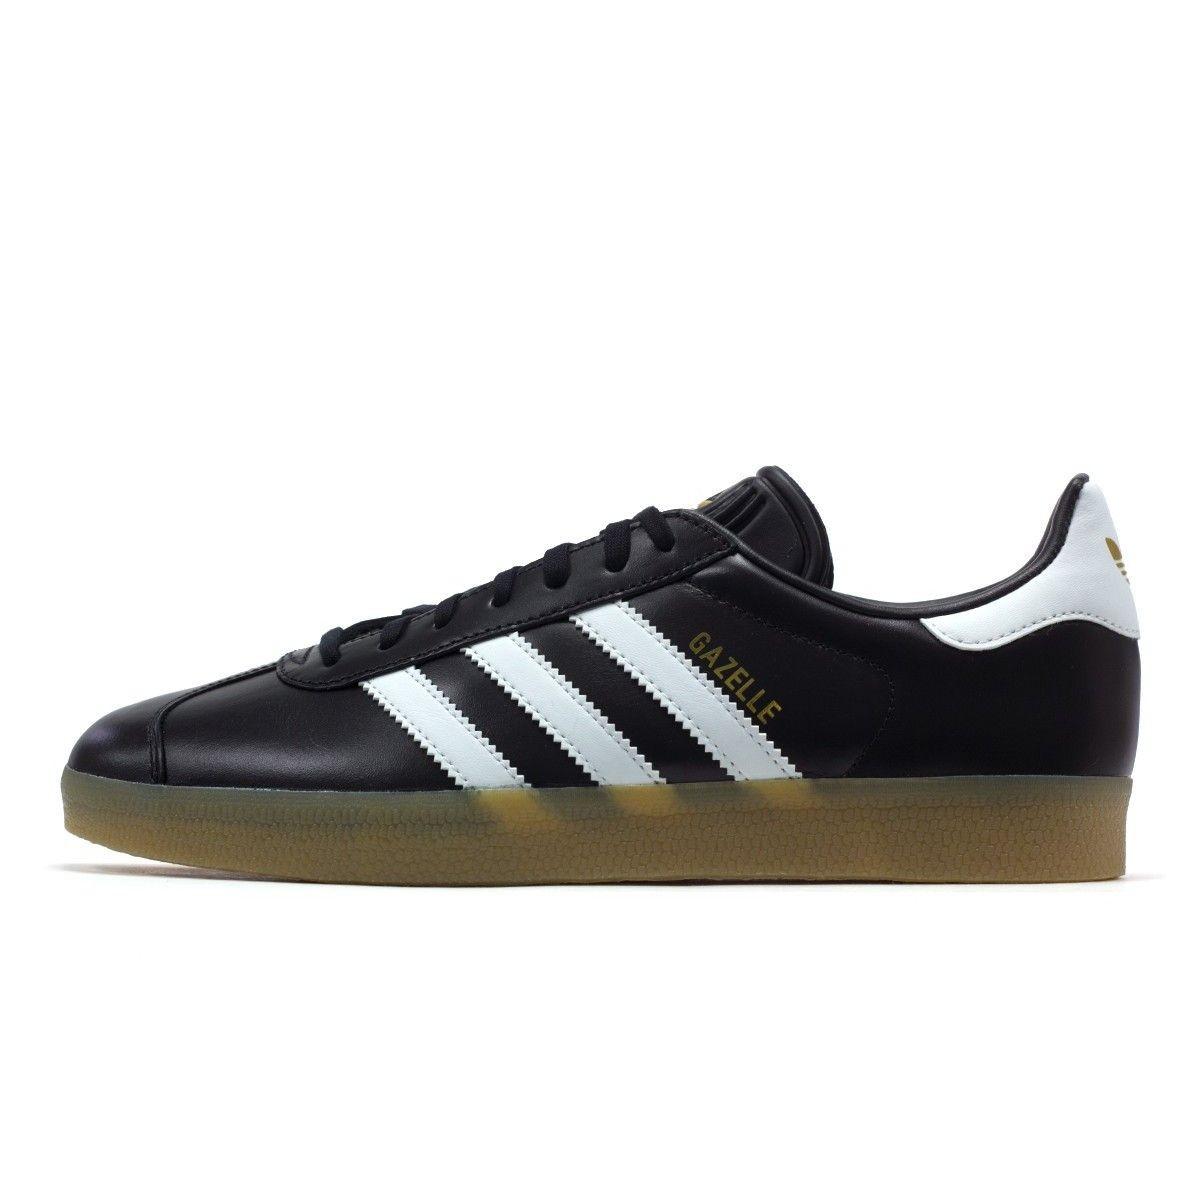 Baskets Adidas Gazelle Noir Homme Taille : 40;40 23;46 2